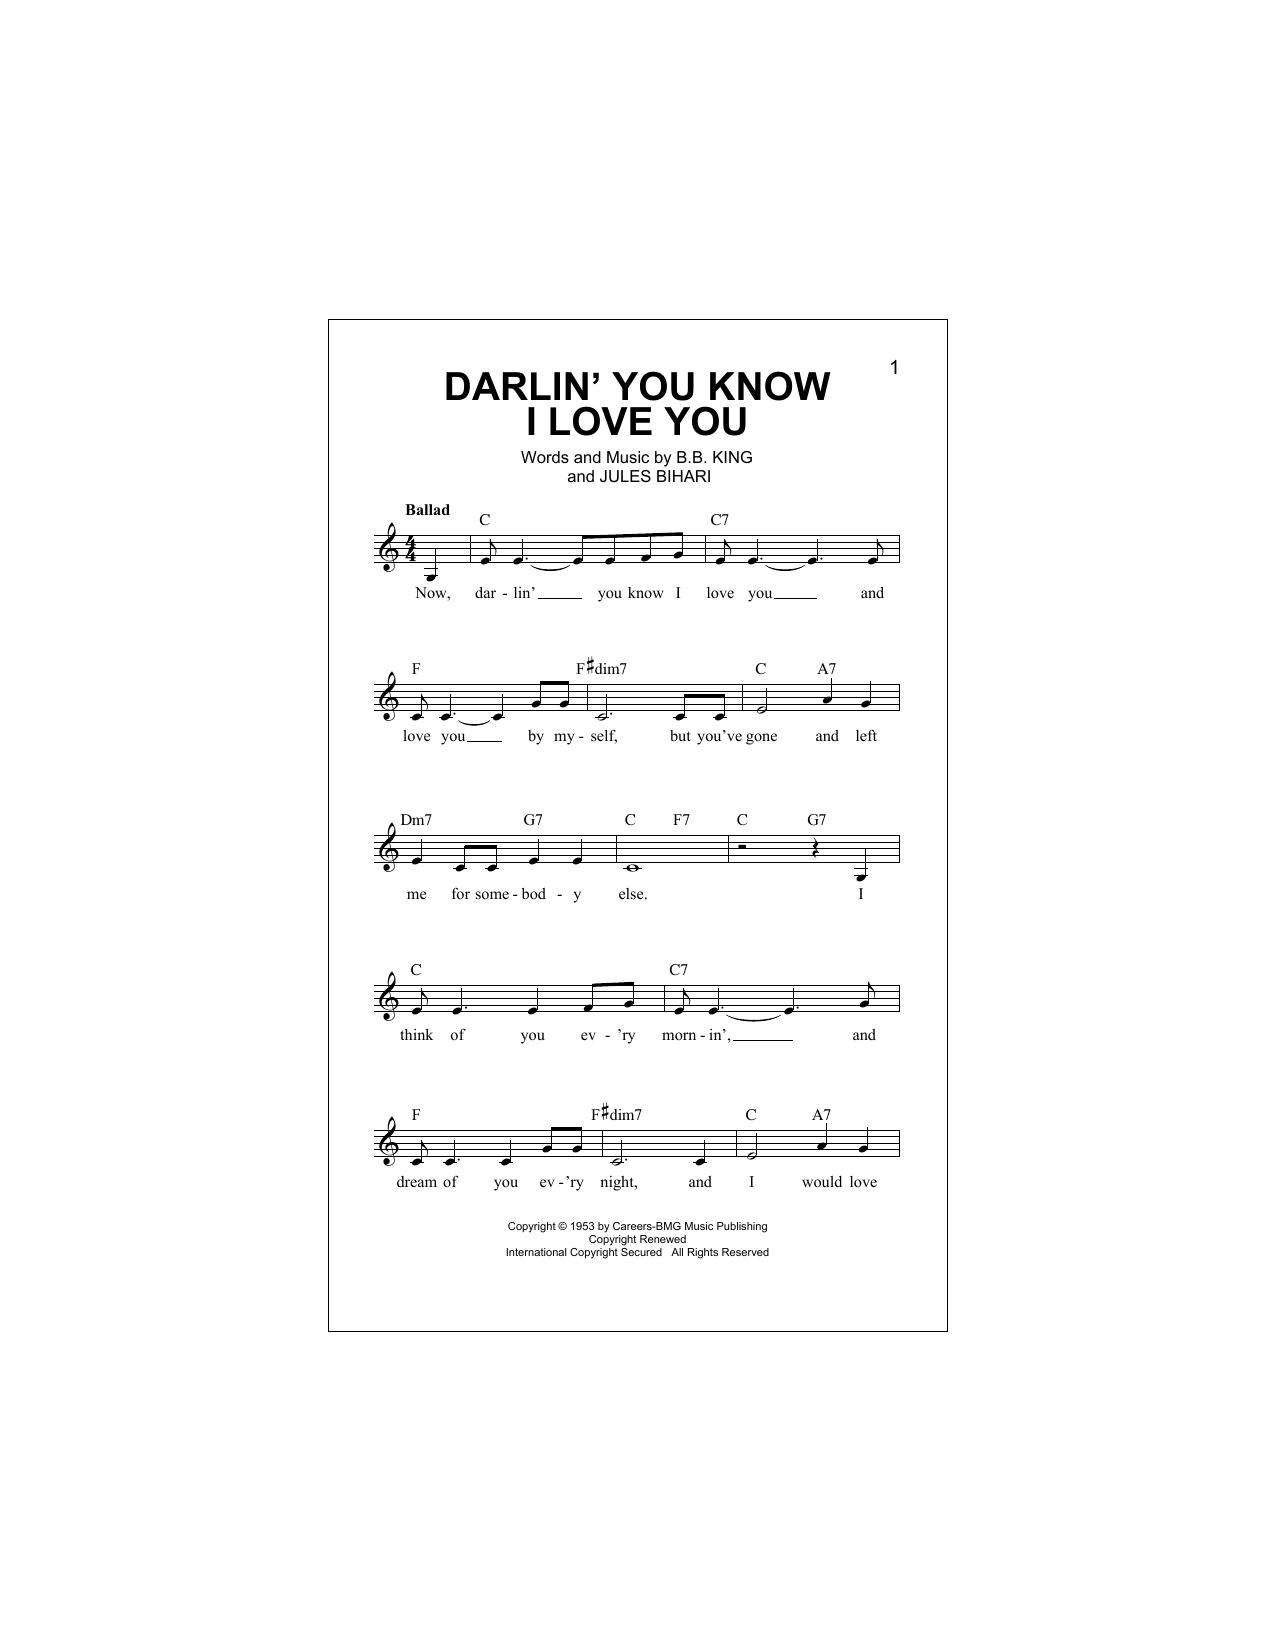 Darlin' You Know I Love You Sheet Music